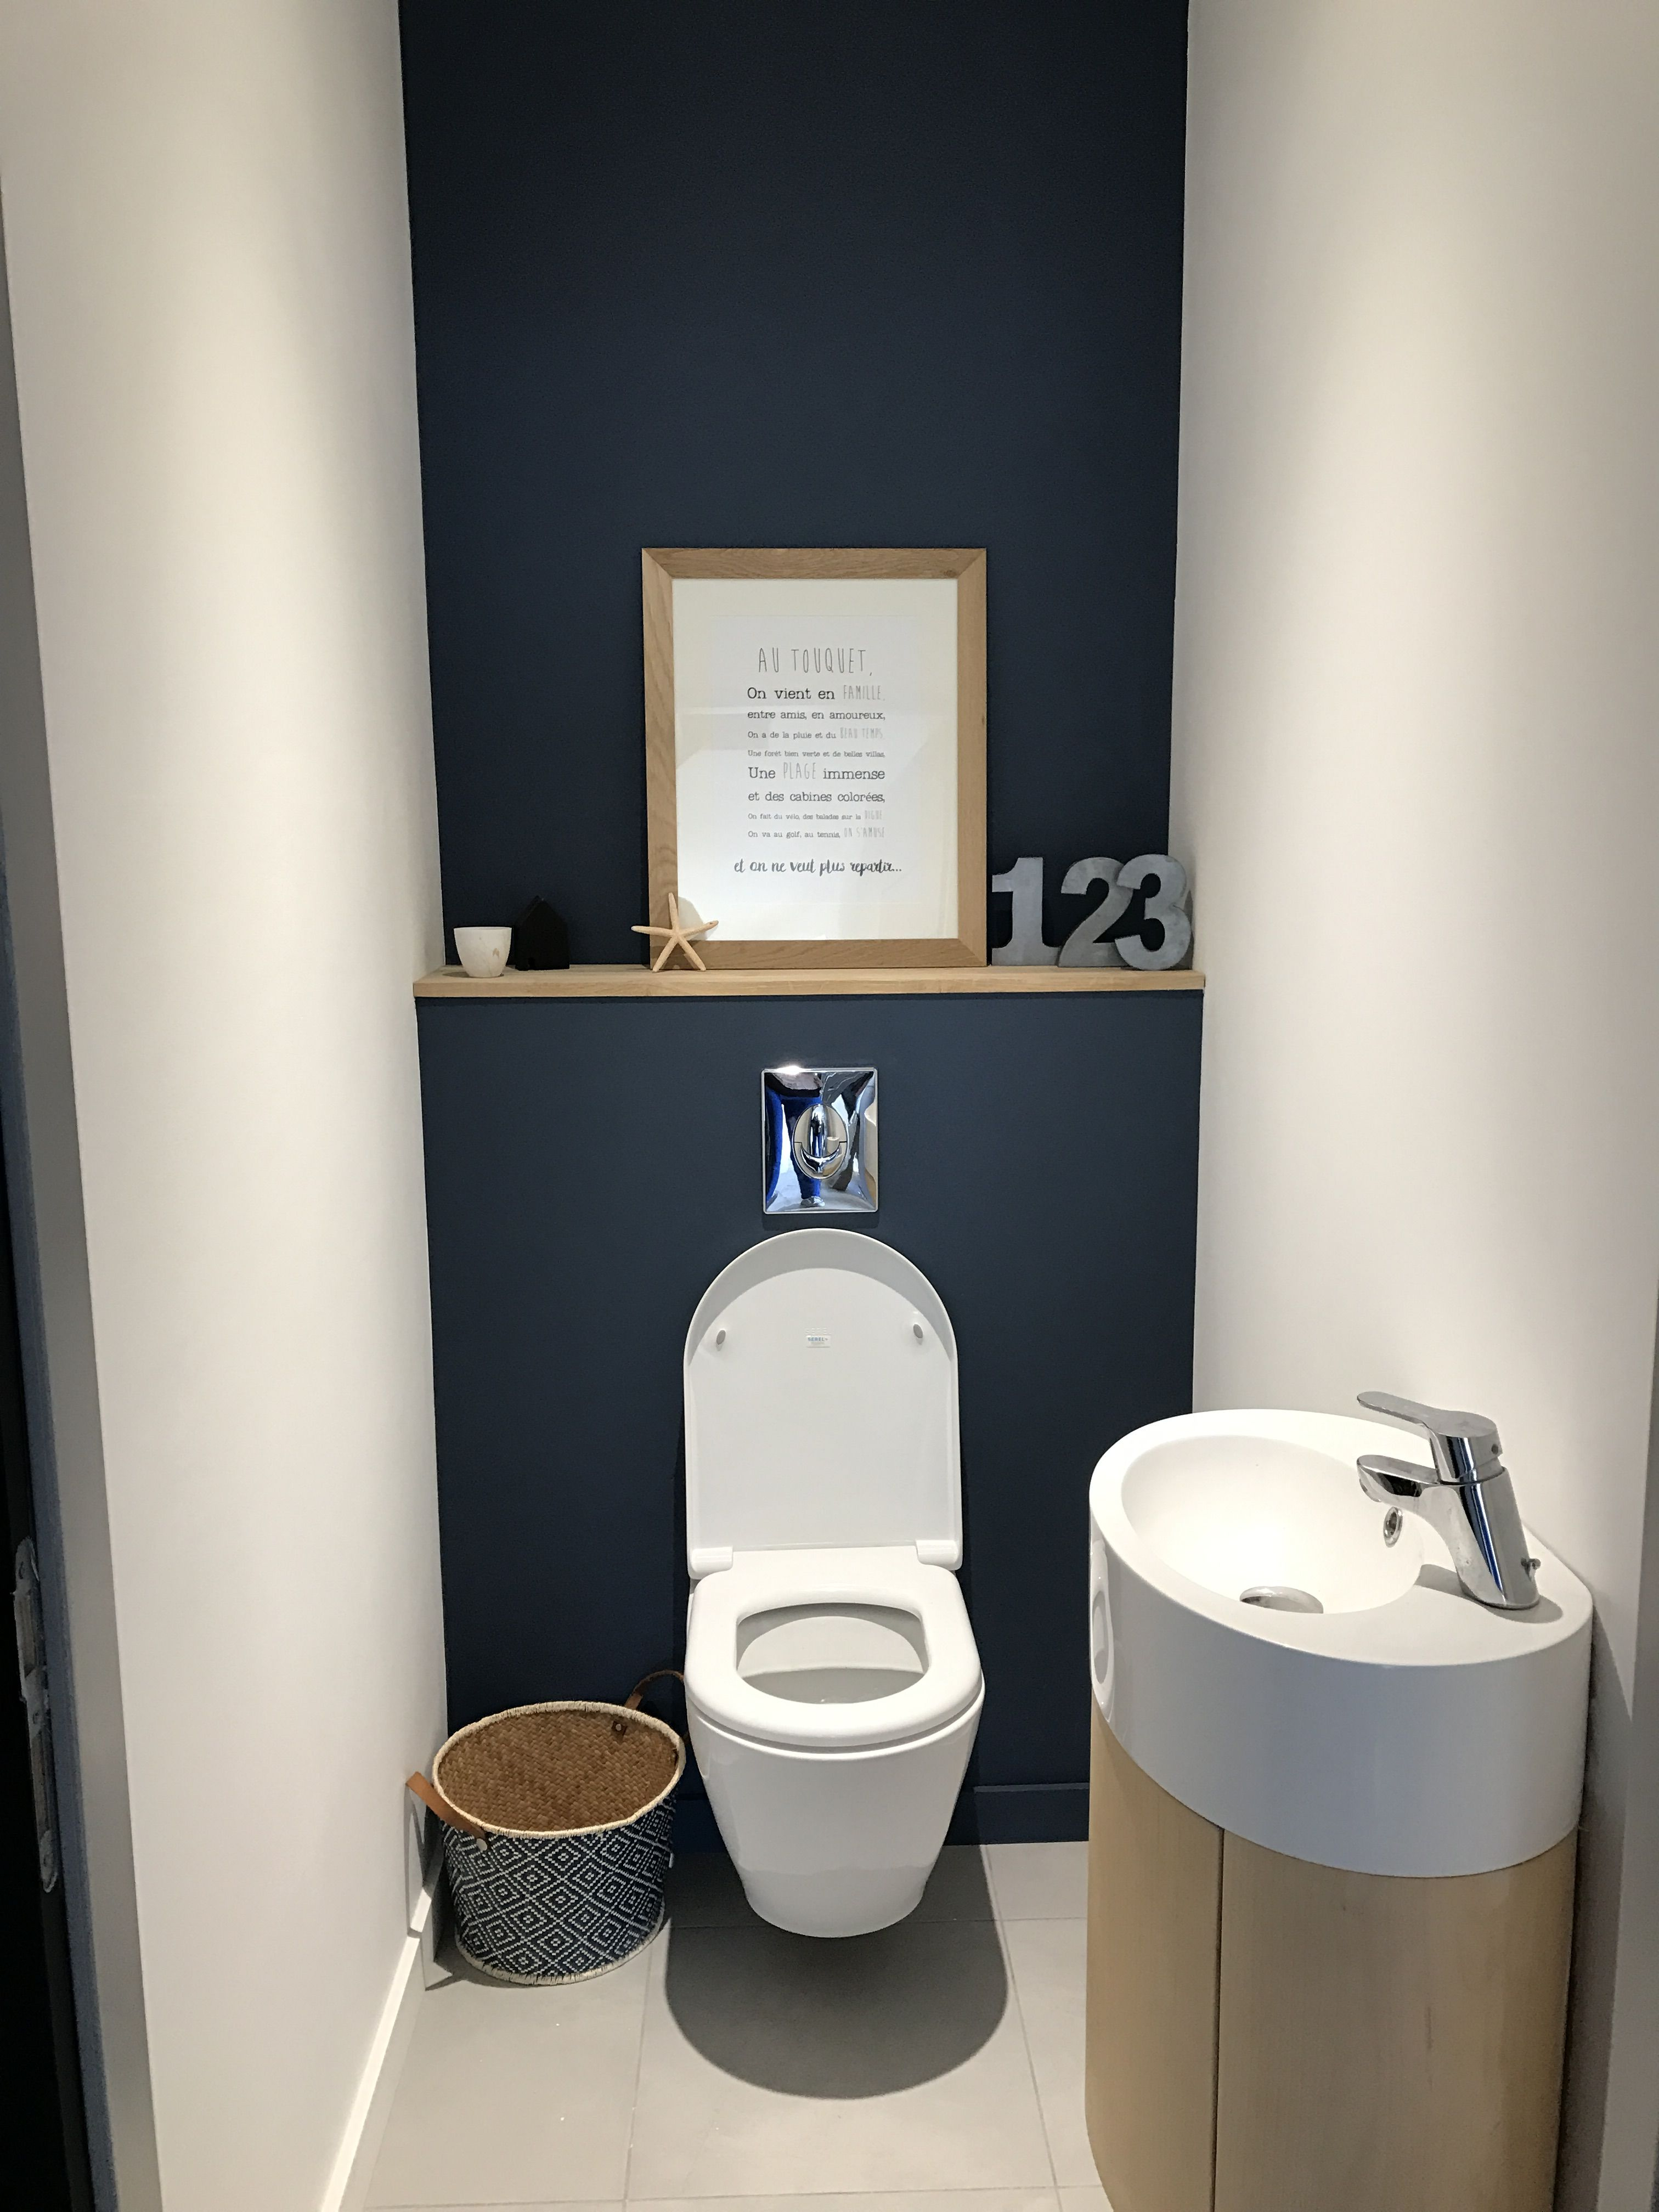 Idee Deco Wc Suspendu Idee Deco Wc Suspendu Idee Deco Toilettes Deco Toilettes